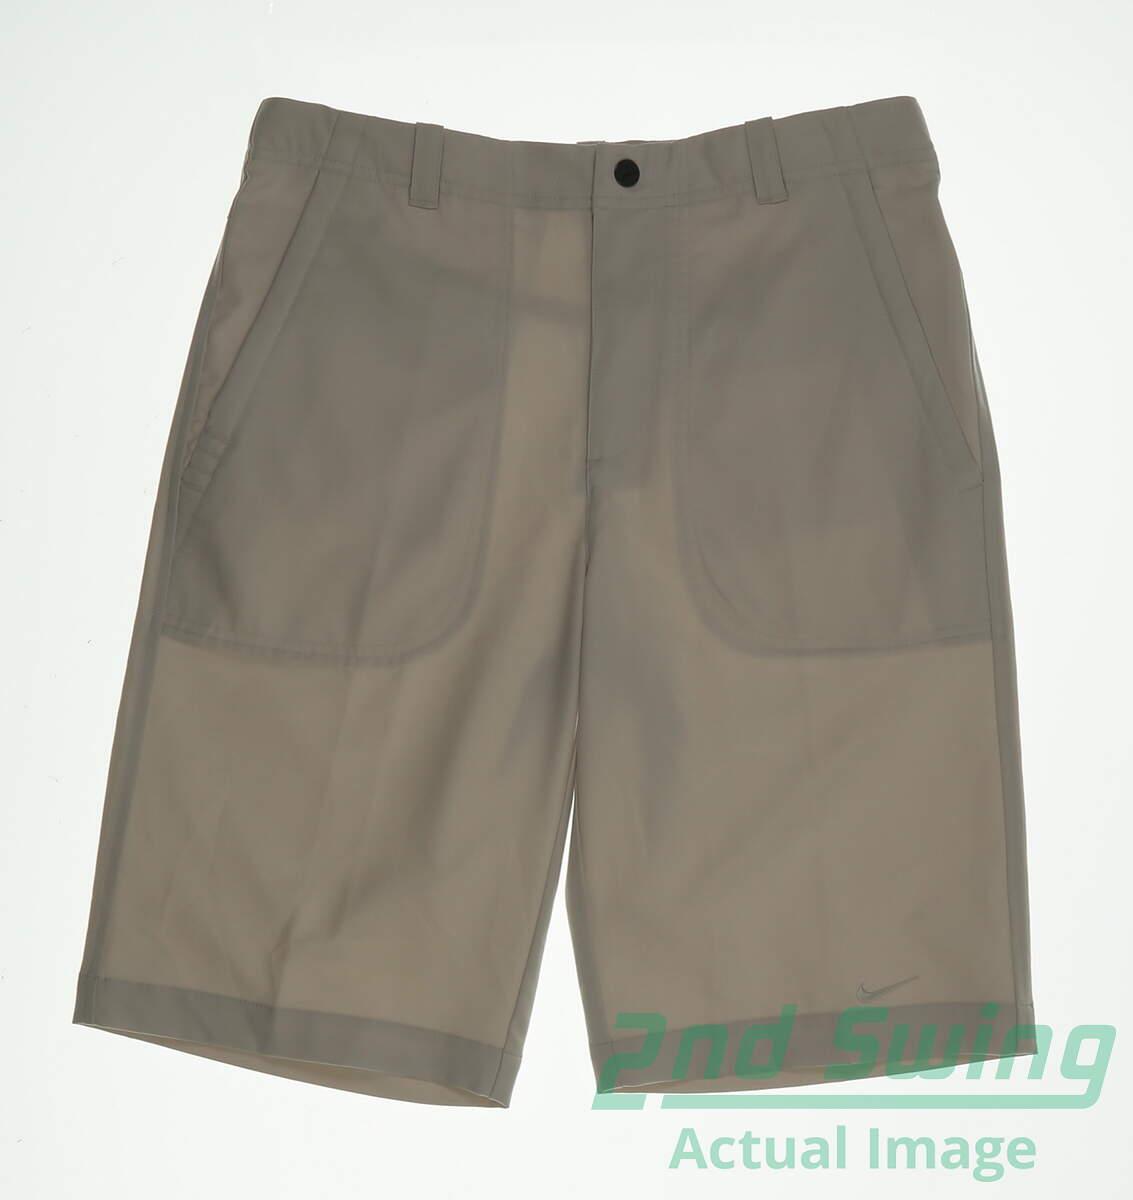 New Womens Nike Golf Shorts Size Large L Tan MSRP  90  21c6b5d44